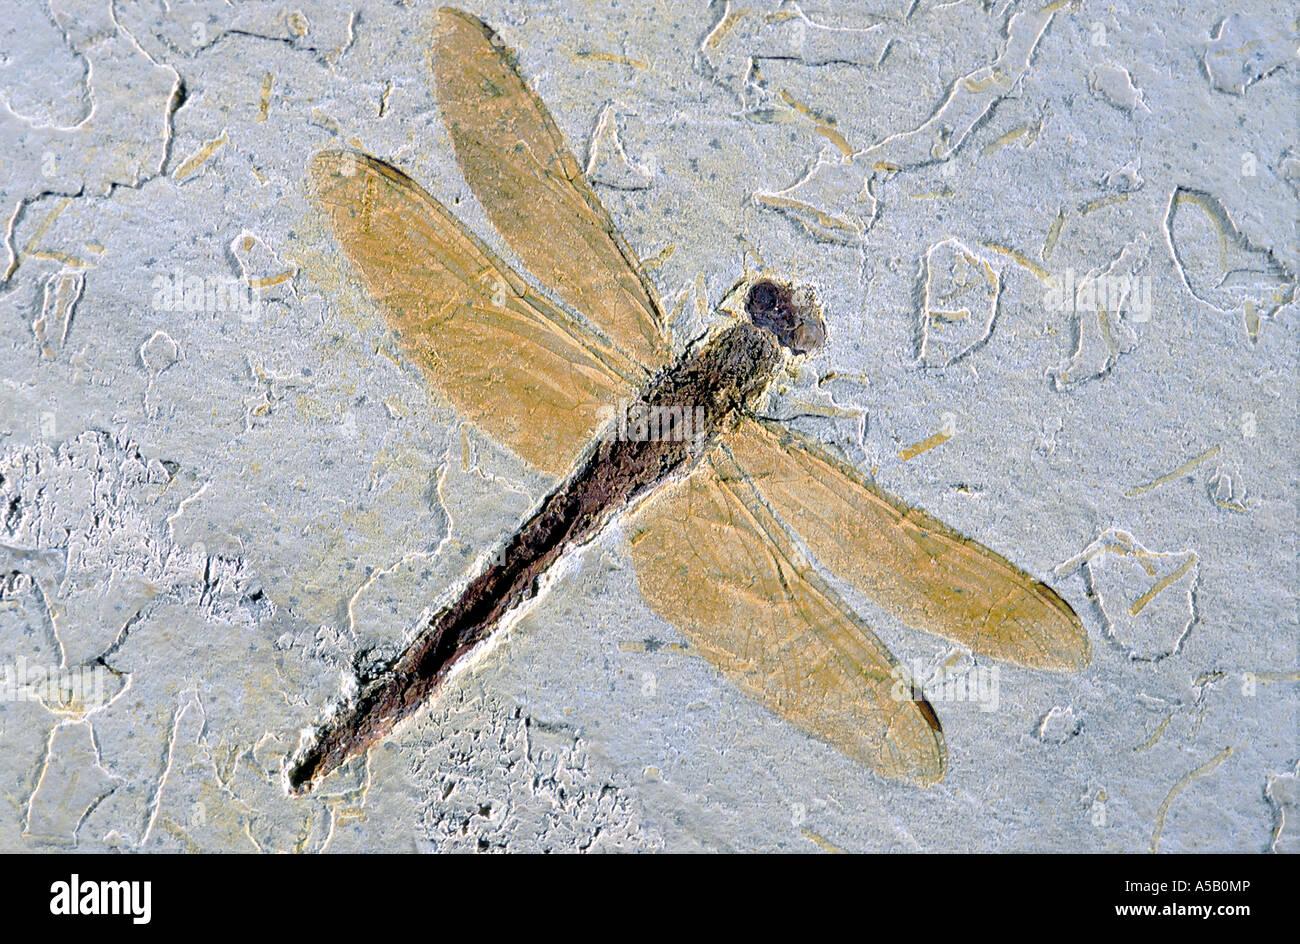 Libélula fósil araripiana Wightonia Cretácico Inferior Brasil Imagen De Stock